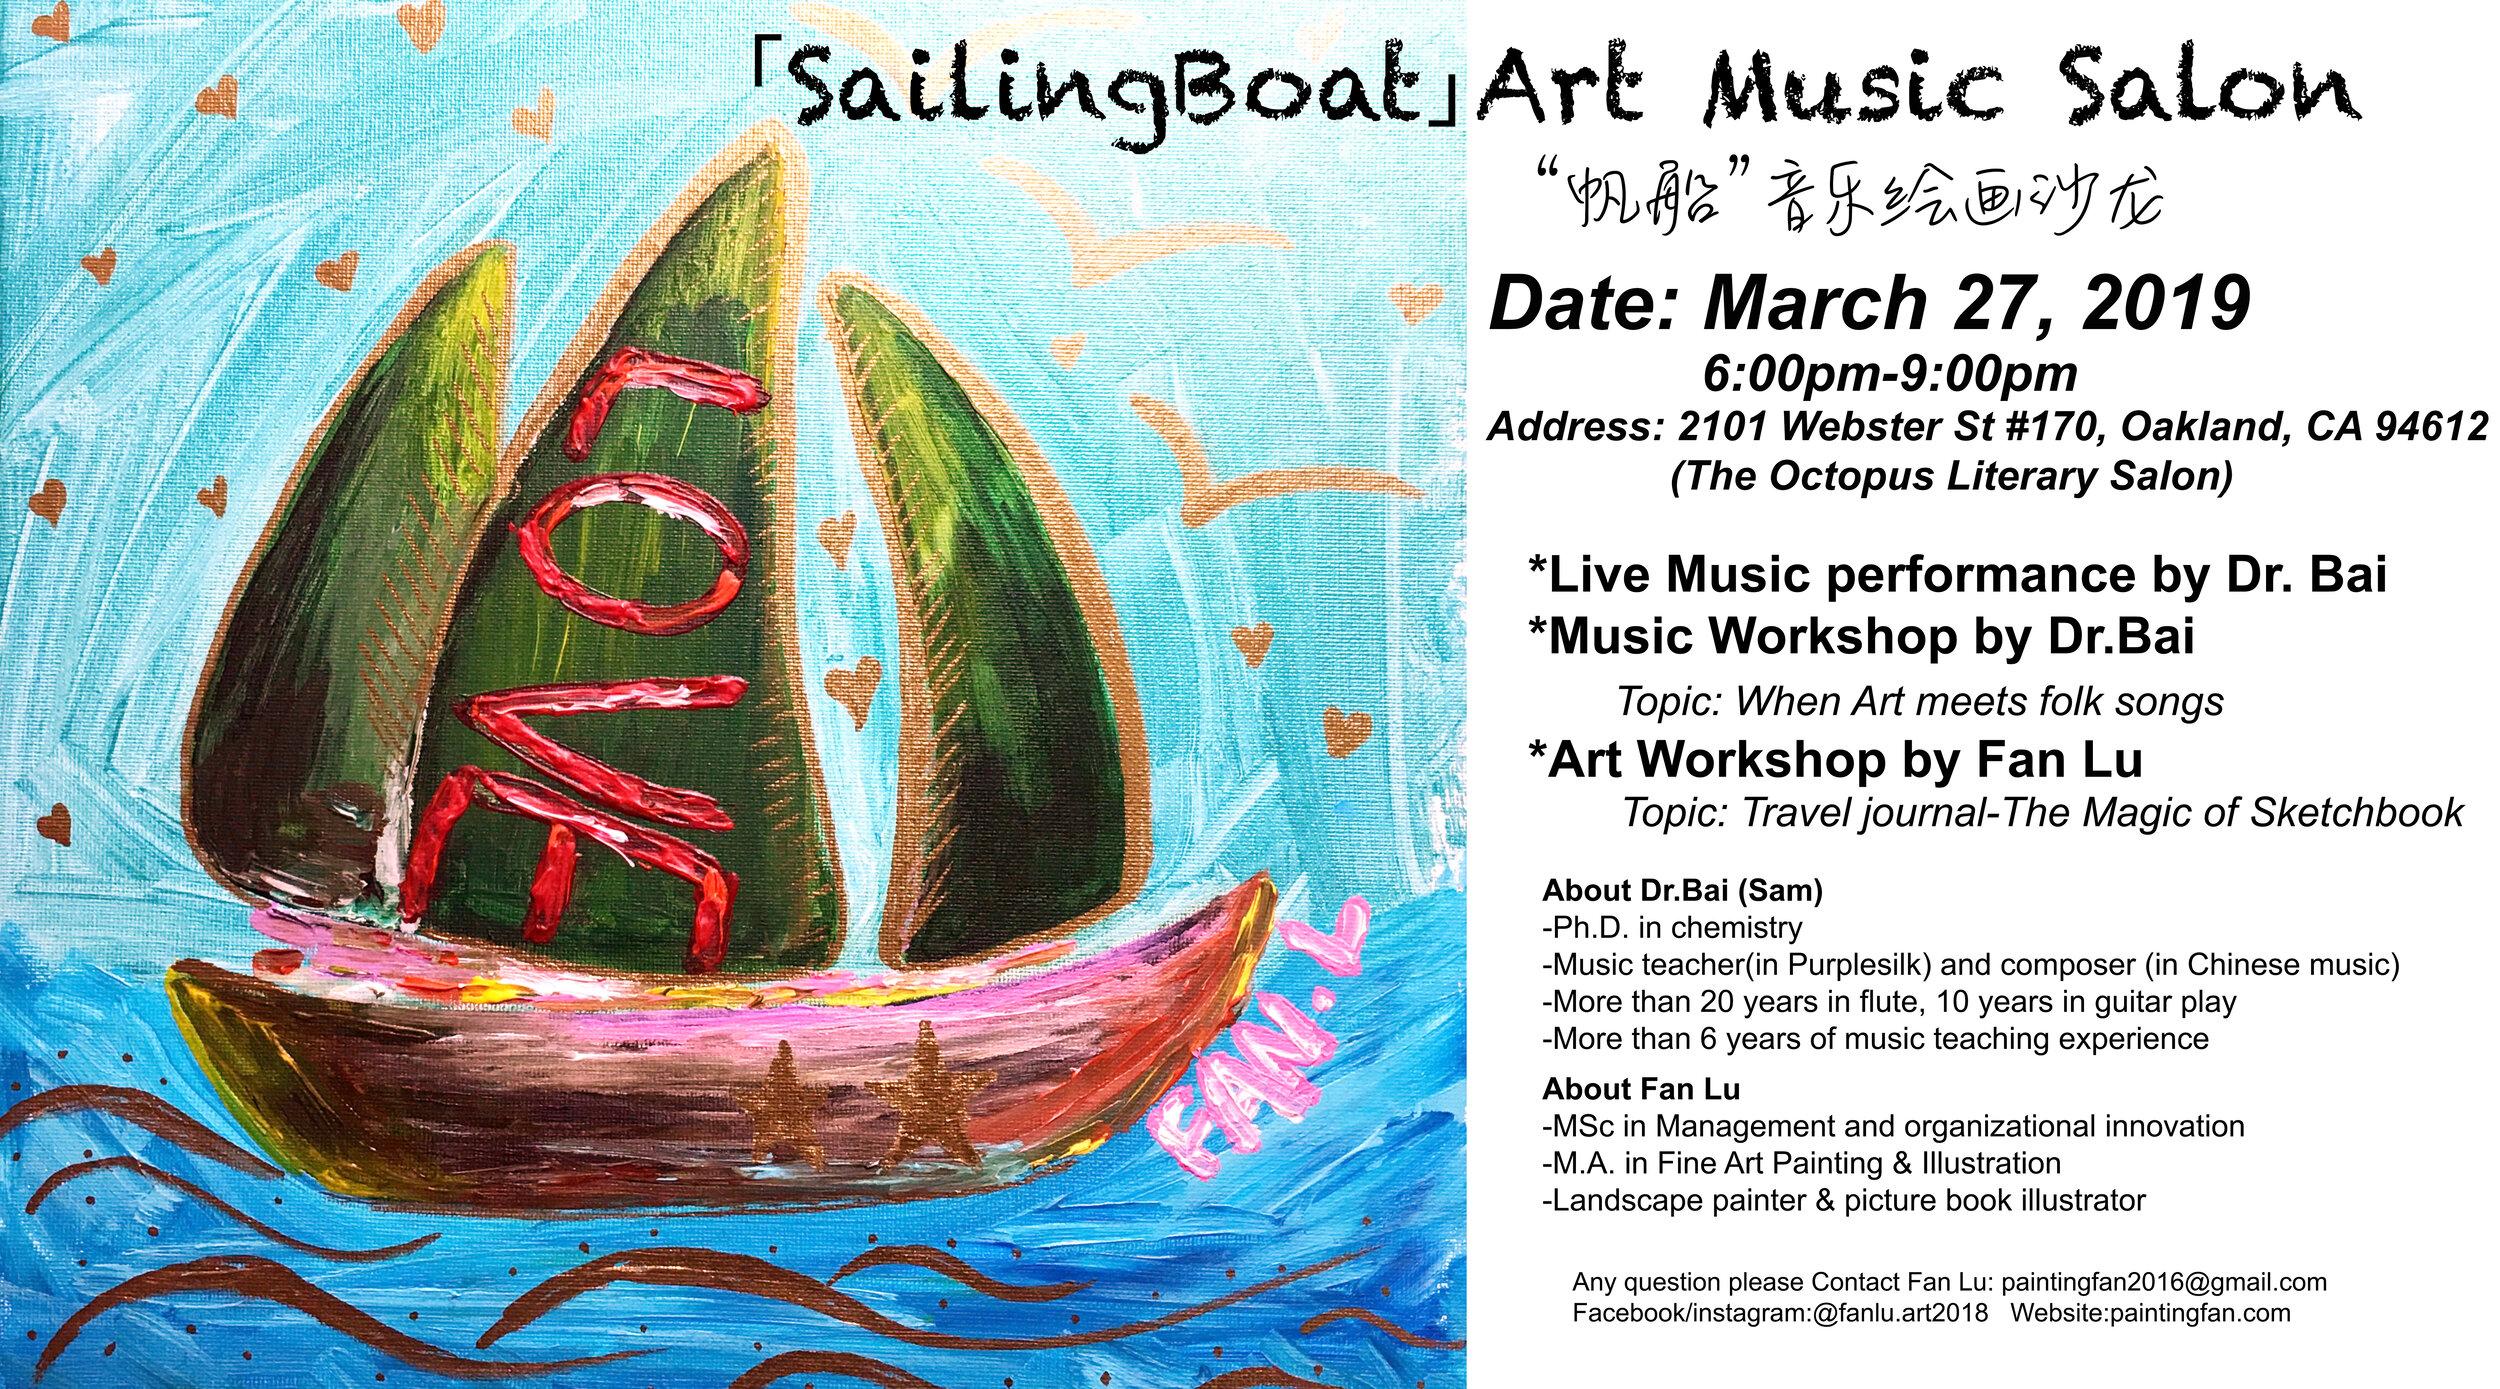 Art Music Salon - Event organized by Fan Lu